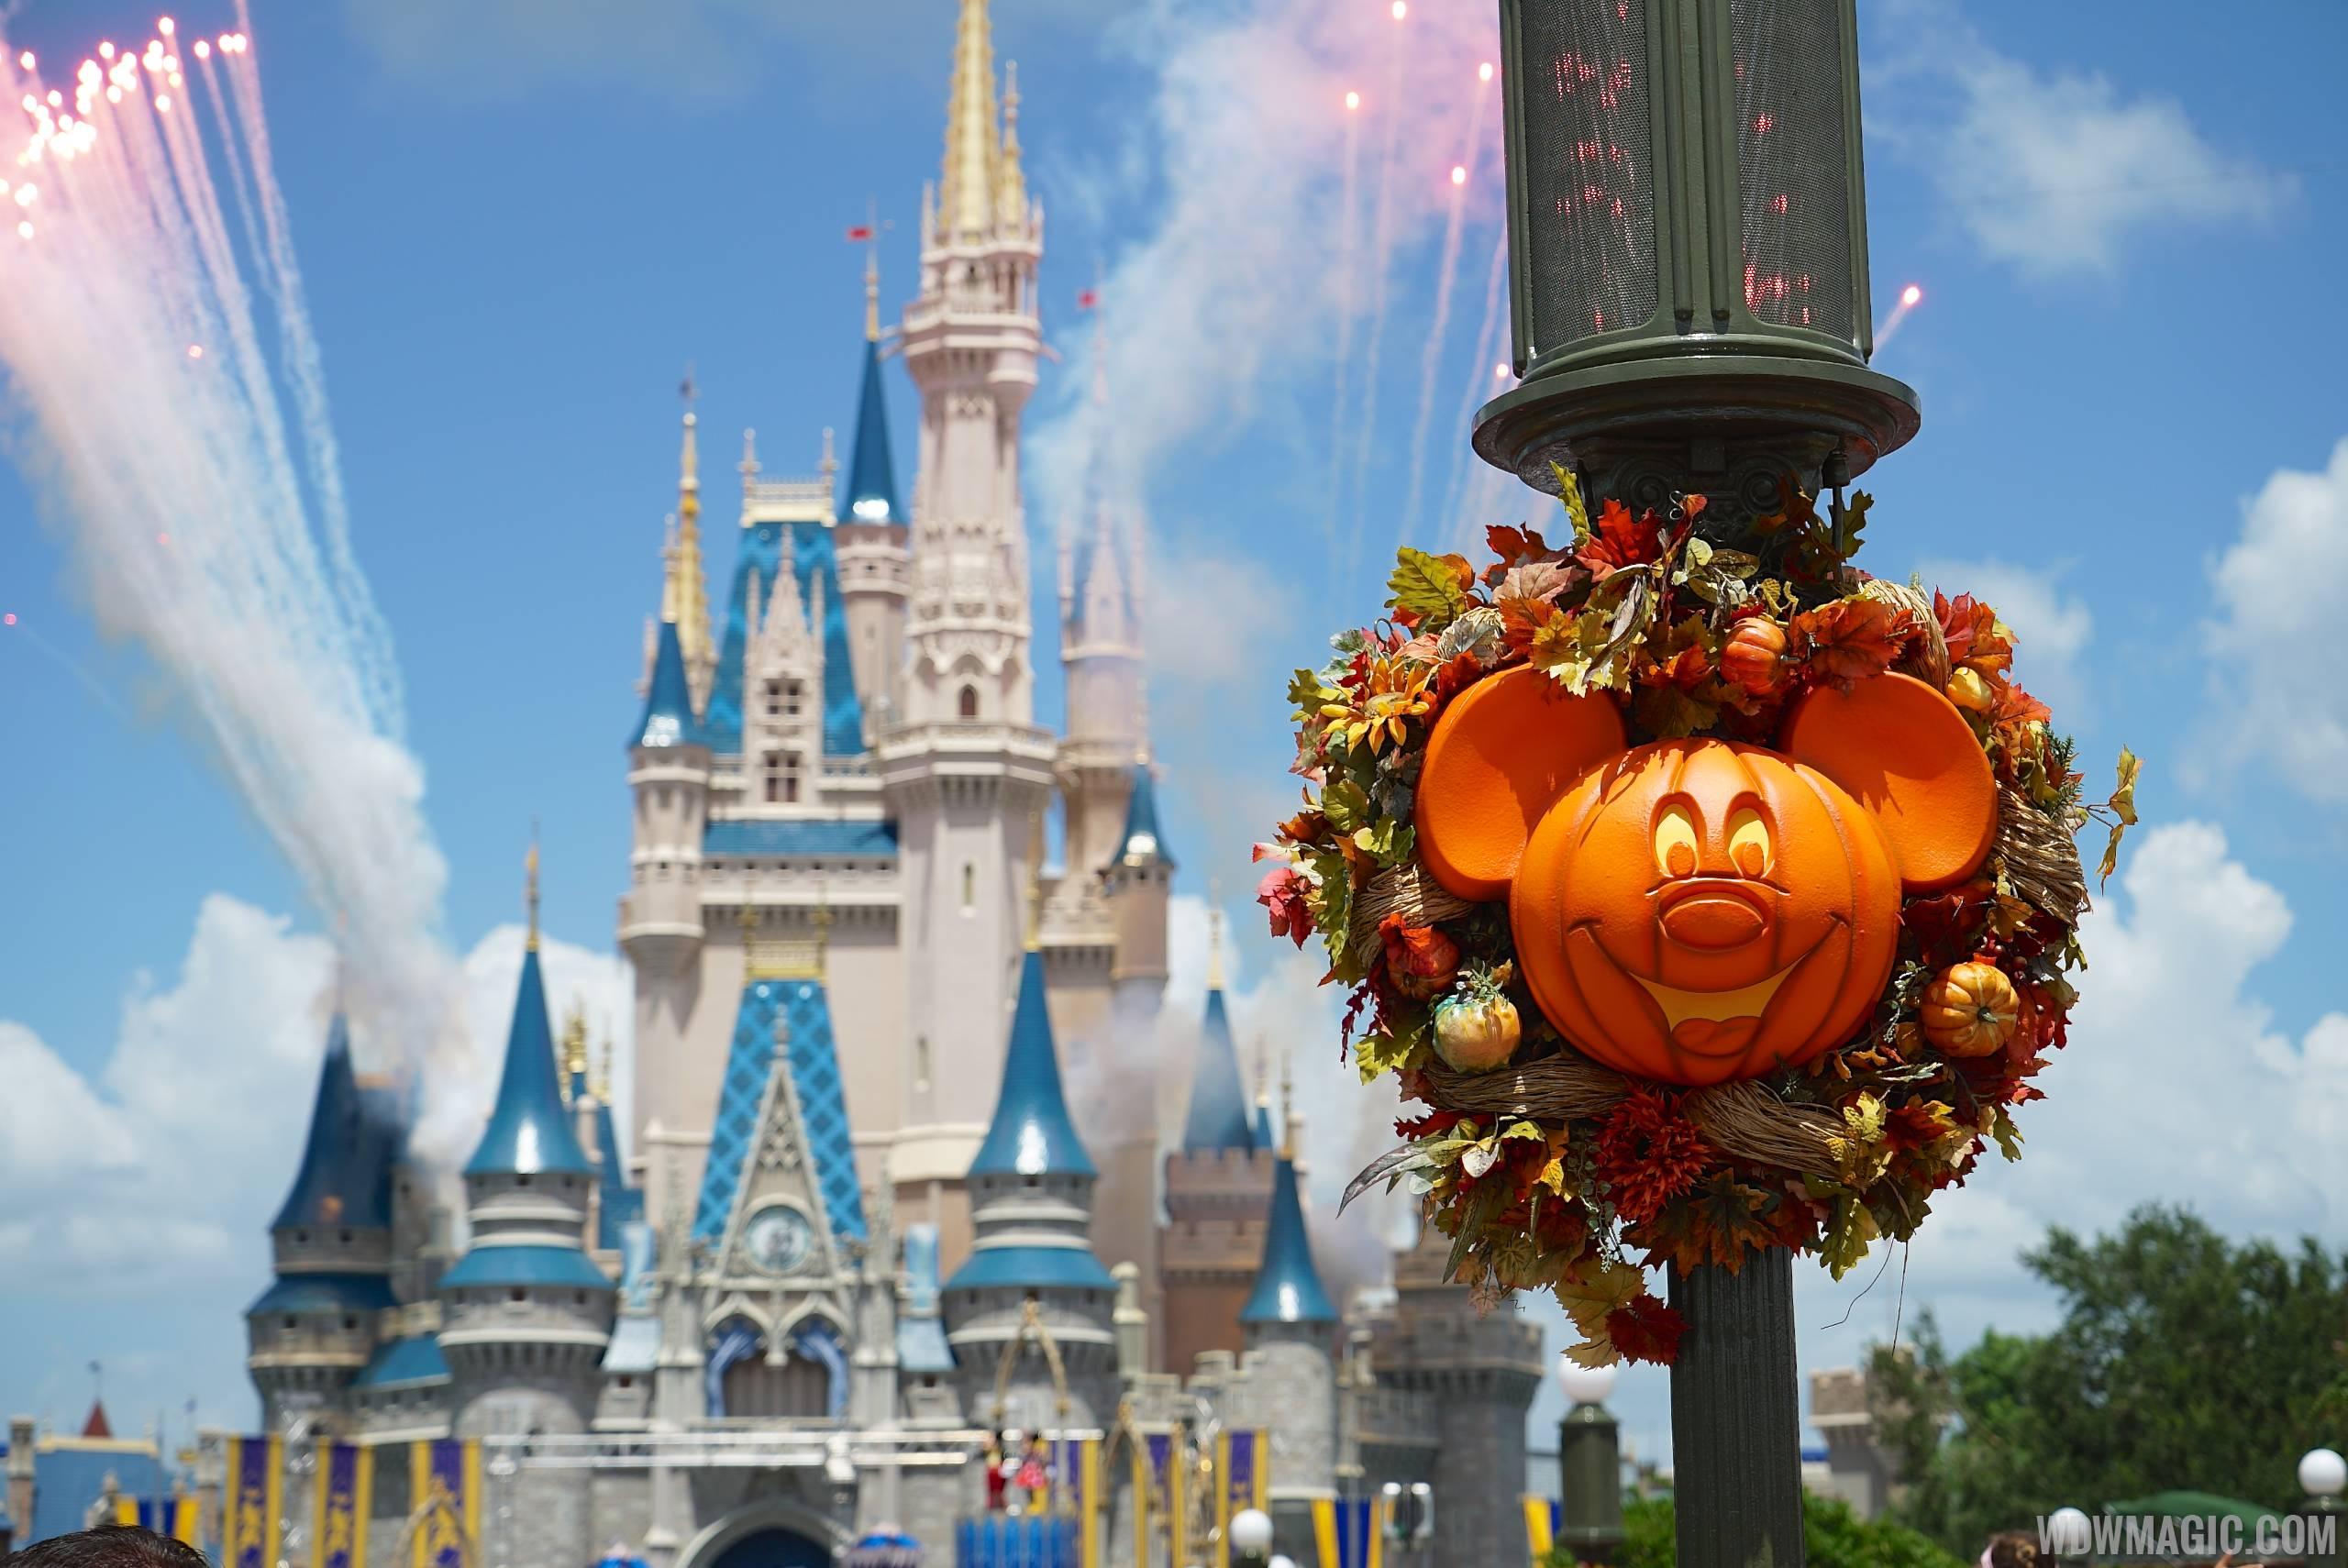 magic kingdoms fall halloween decorations 2014 photo 1 of 37 - Disney World Halloween Decorations